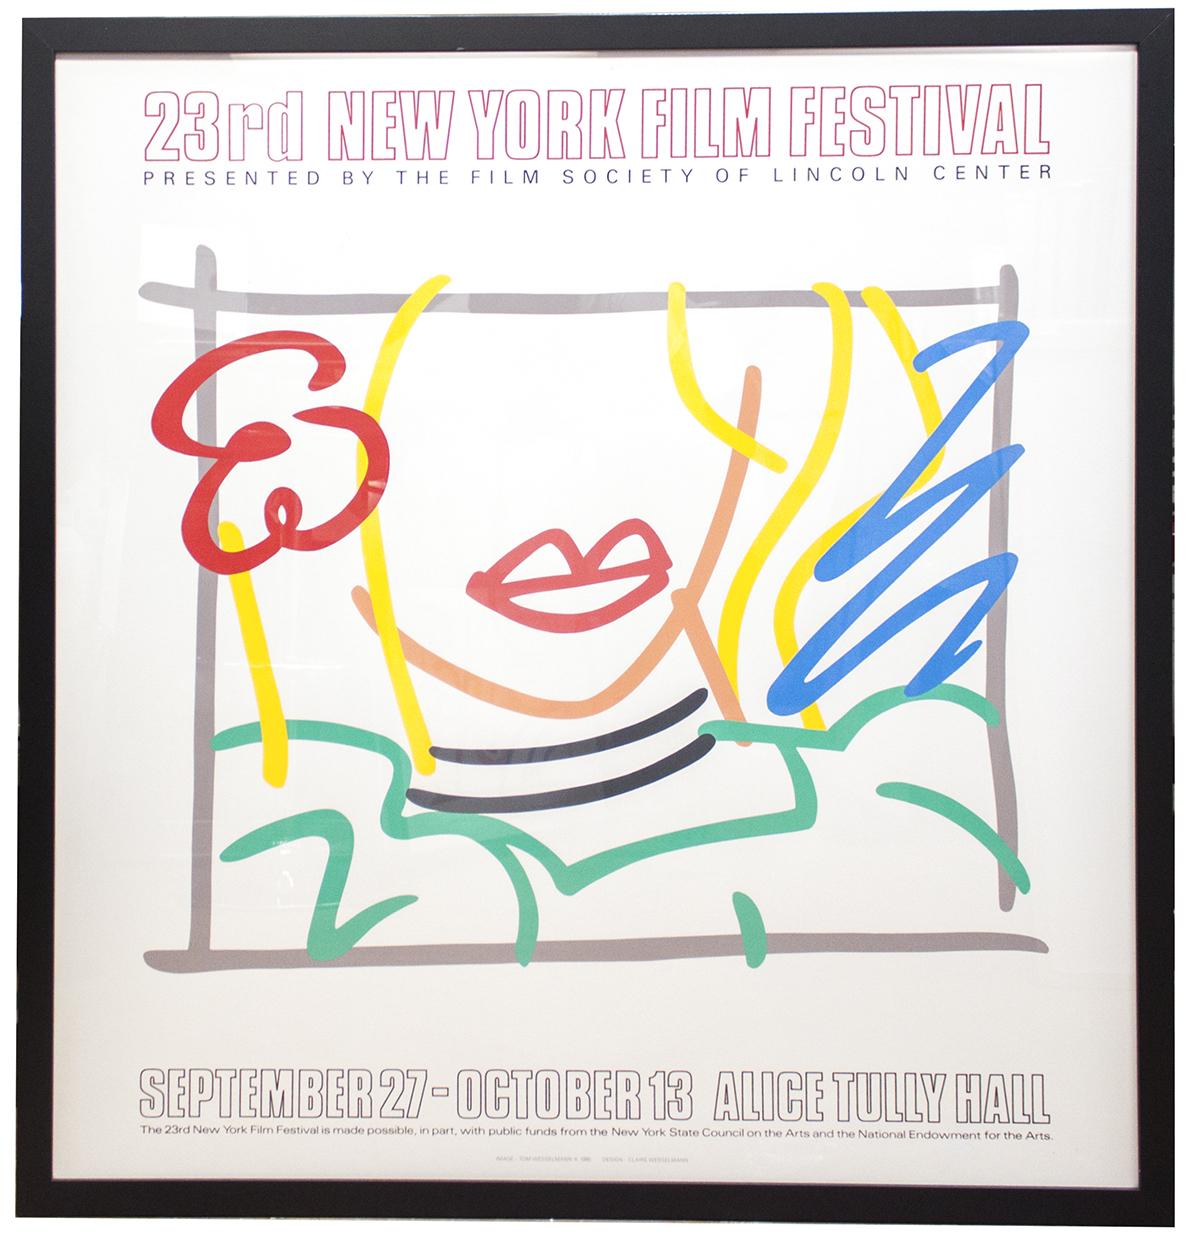 Preschool Teacher Quotes Tom Wesselmann  Monica 23Rd New York Film Festival  1985